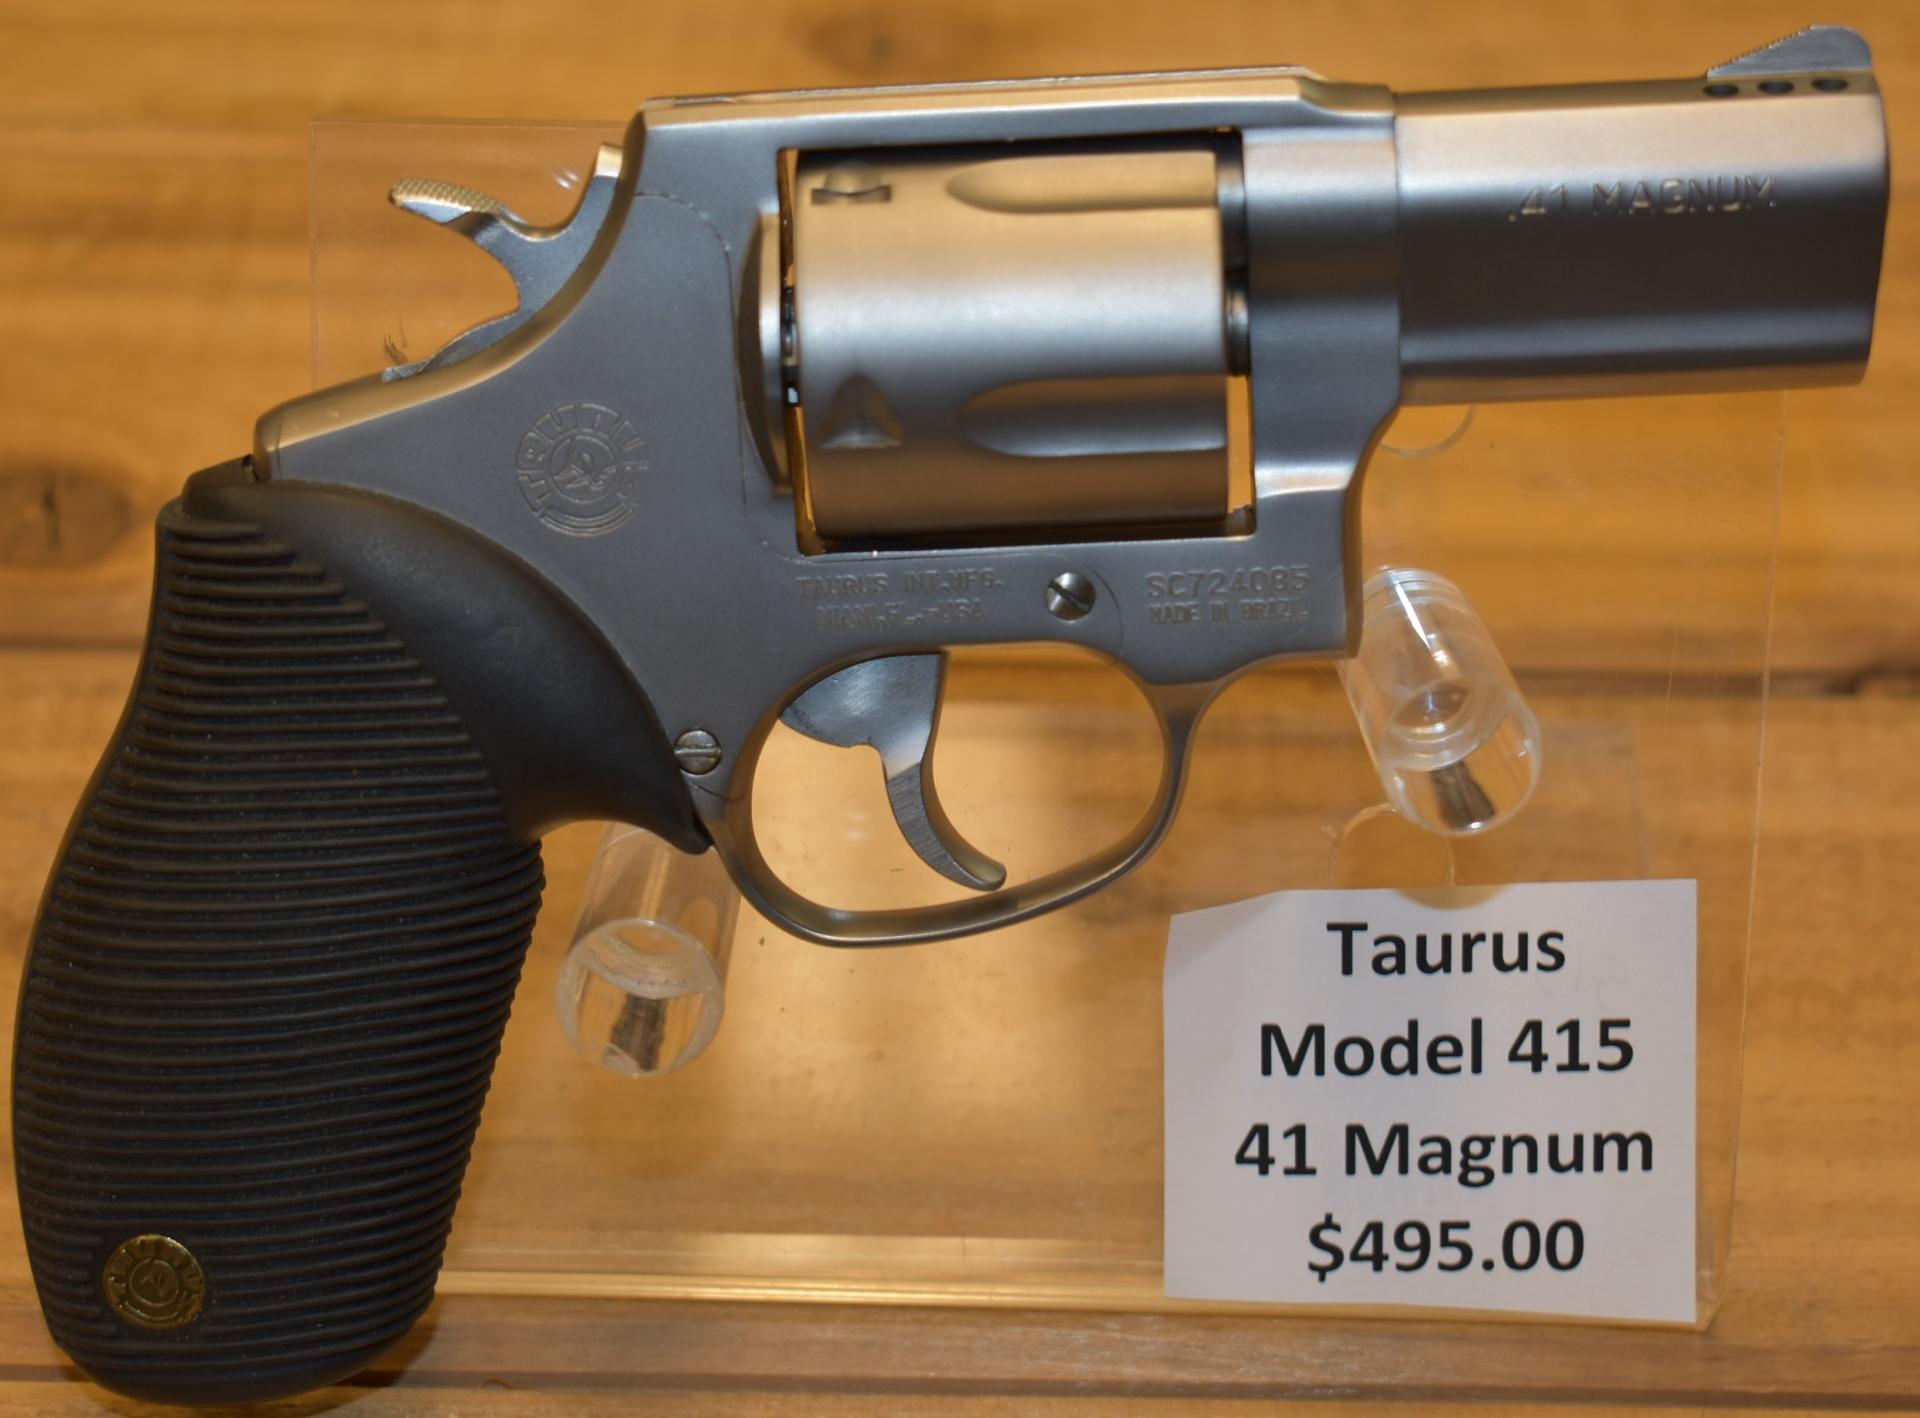 Taurus model 415